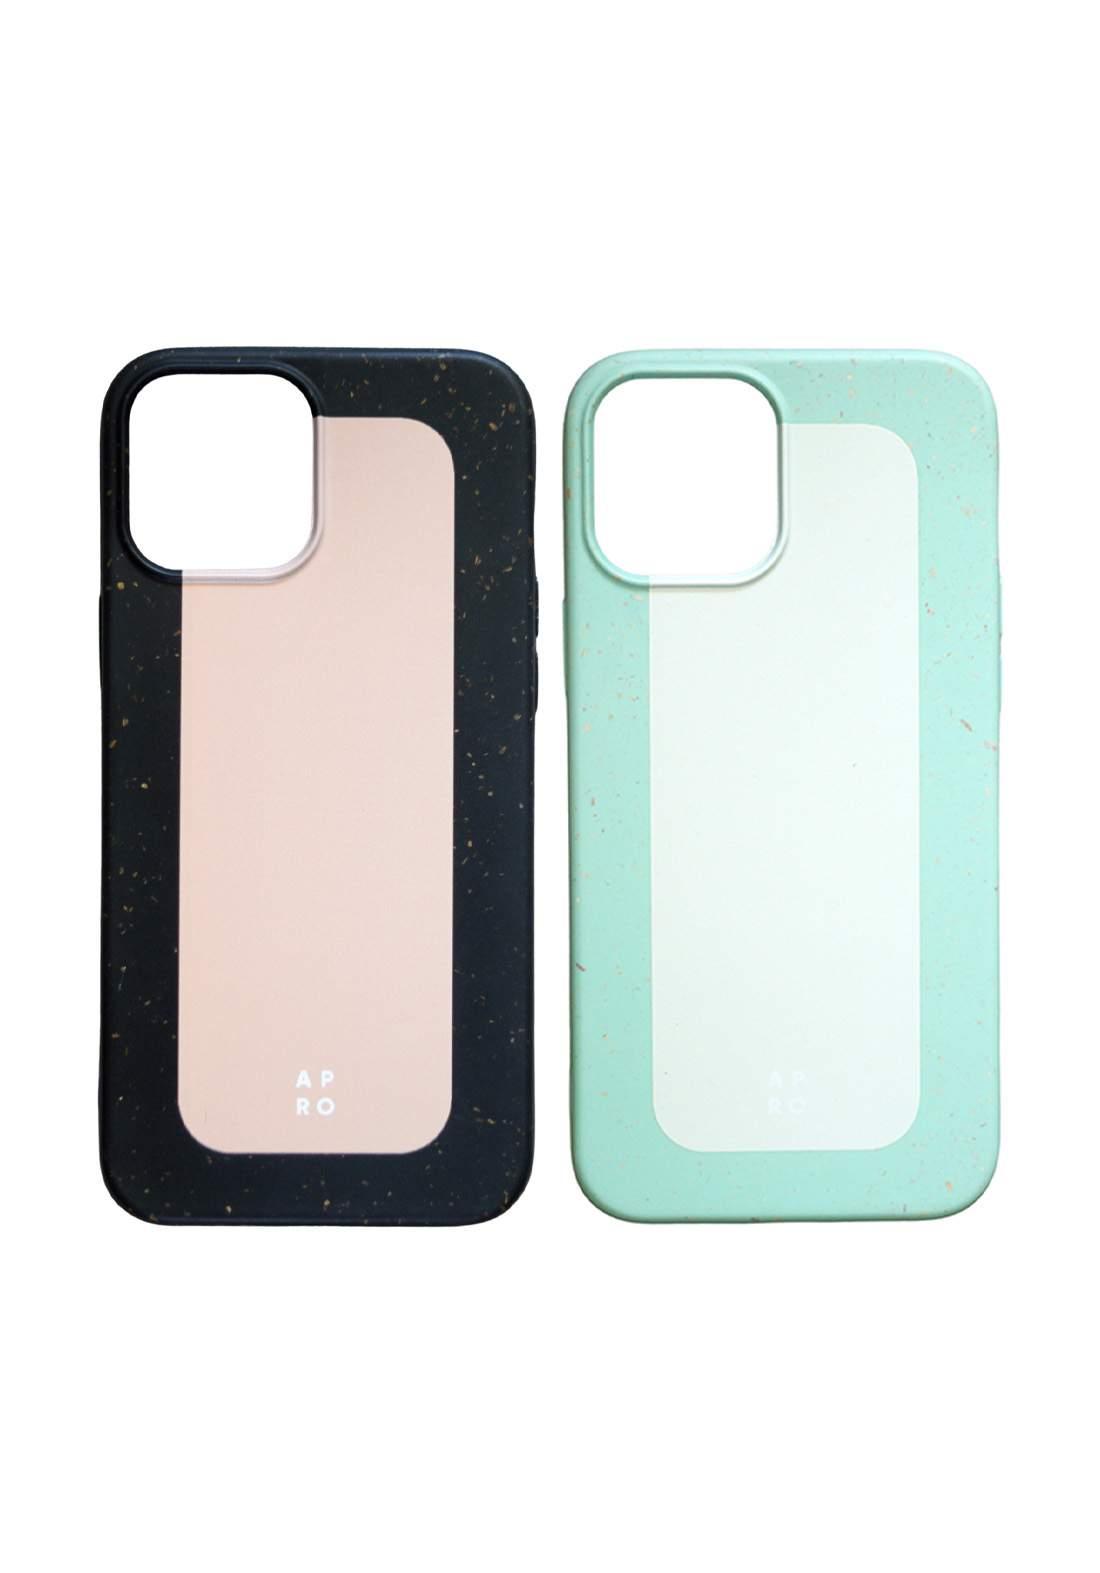 Apro Protective Cover For Iphone 12 Pro Max حافظة موبايل